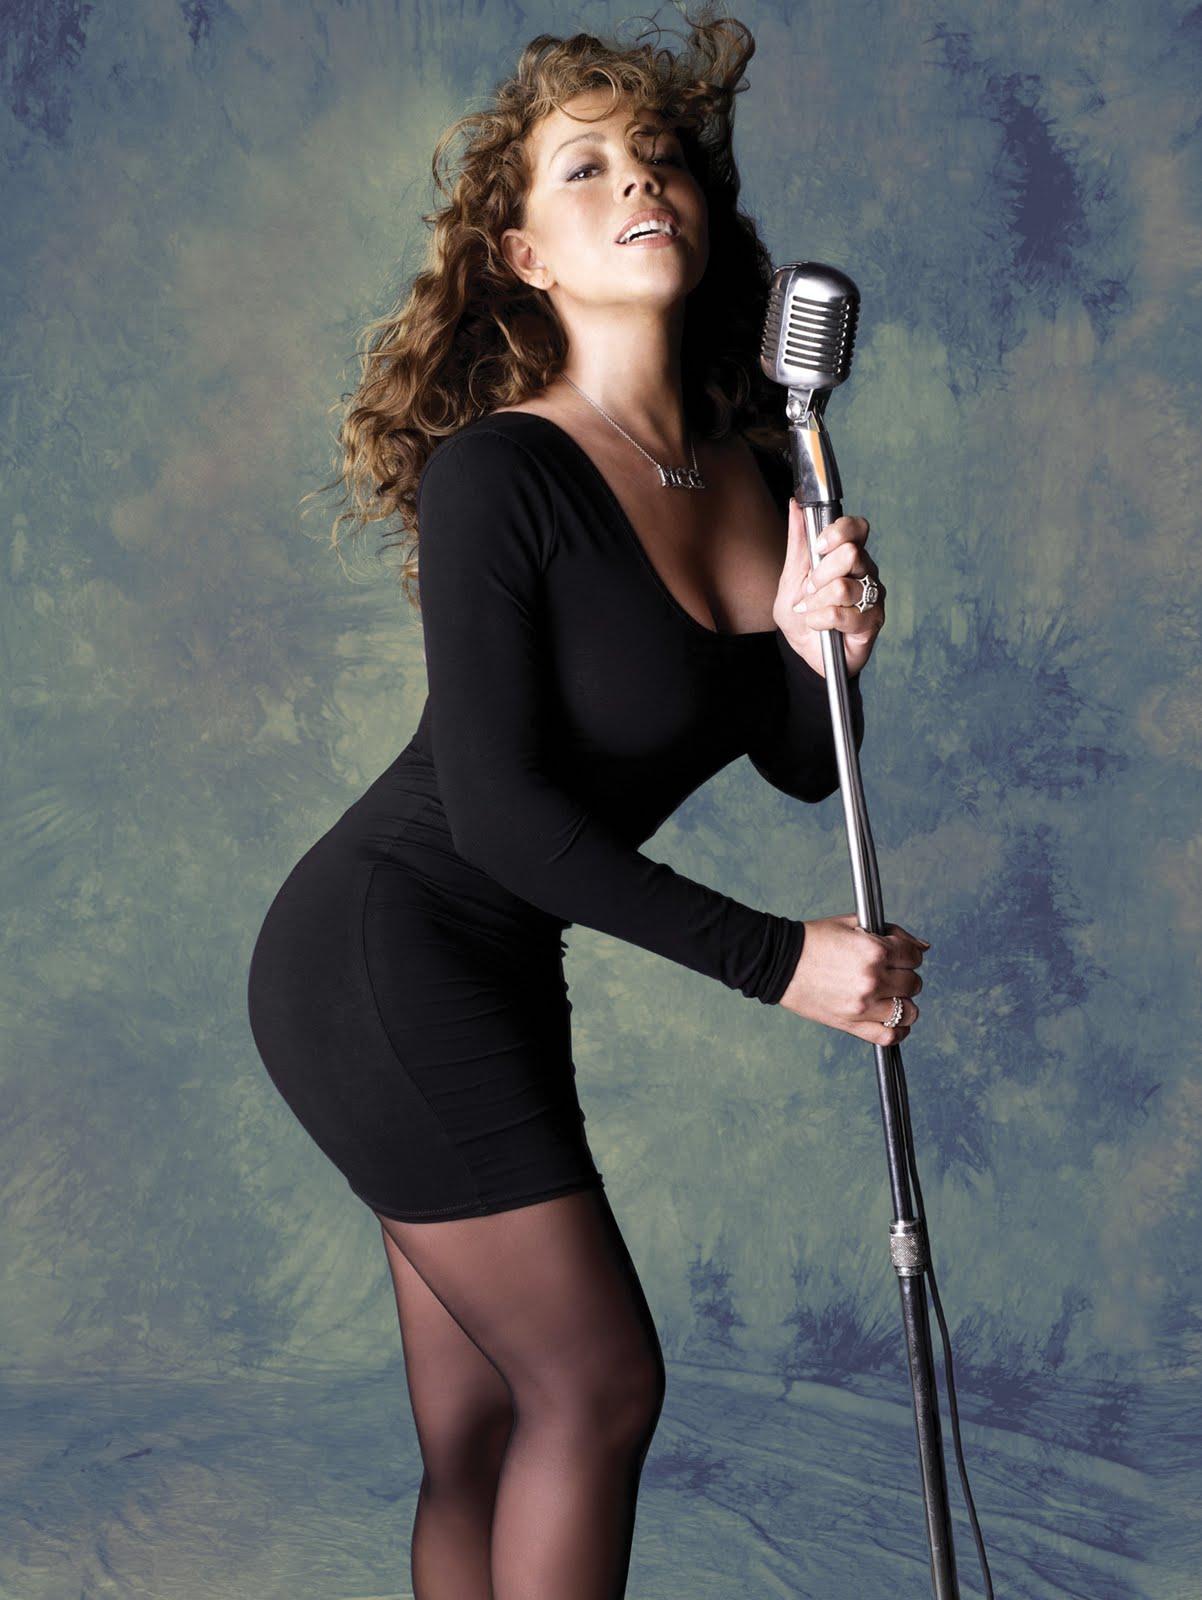 Mariah carey in pantyhose